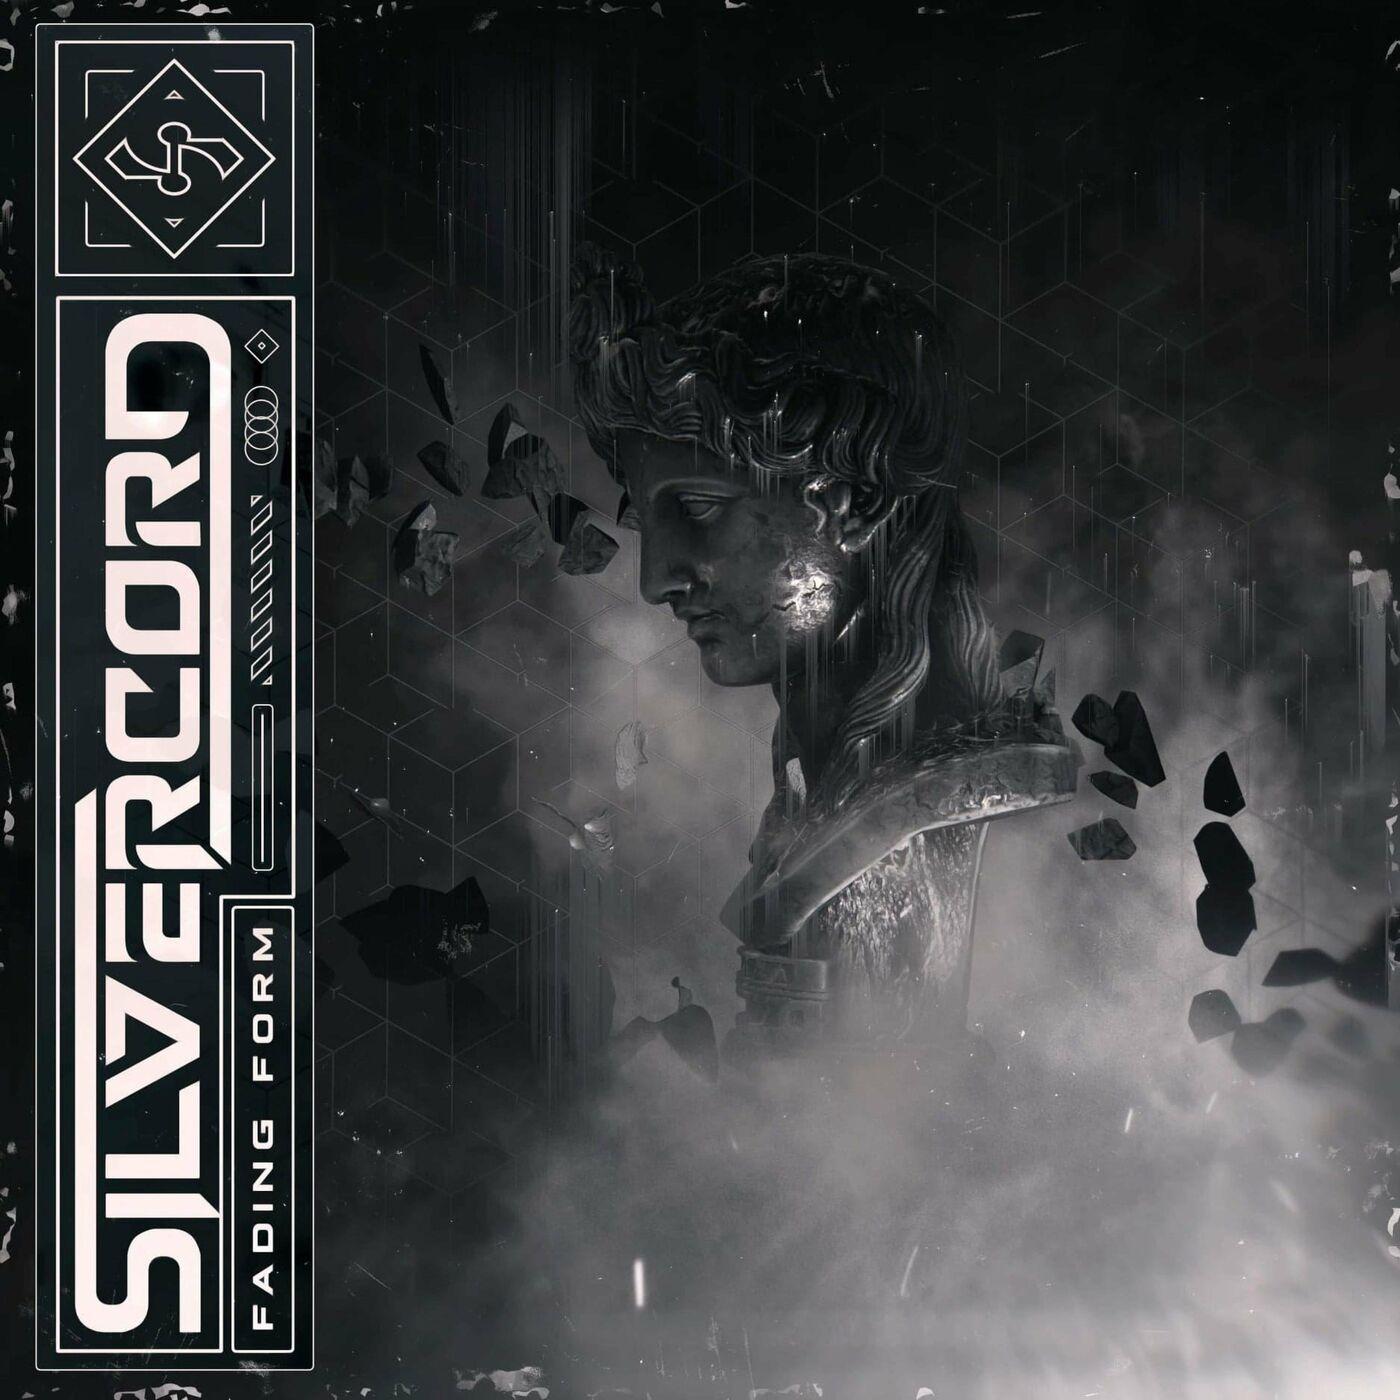 Silvercord - Fading Form [single] (2021)